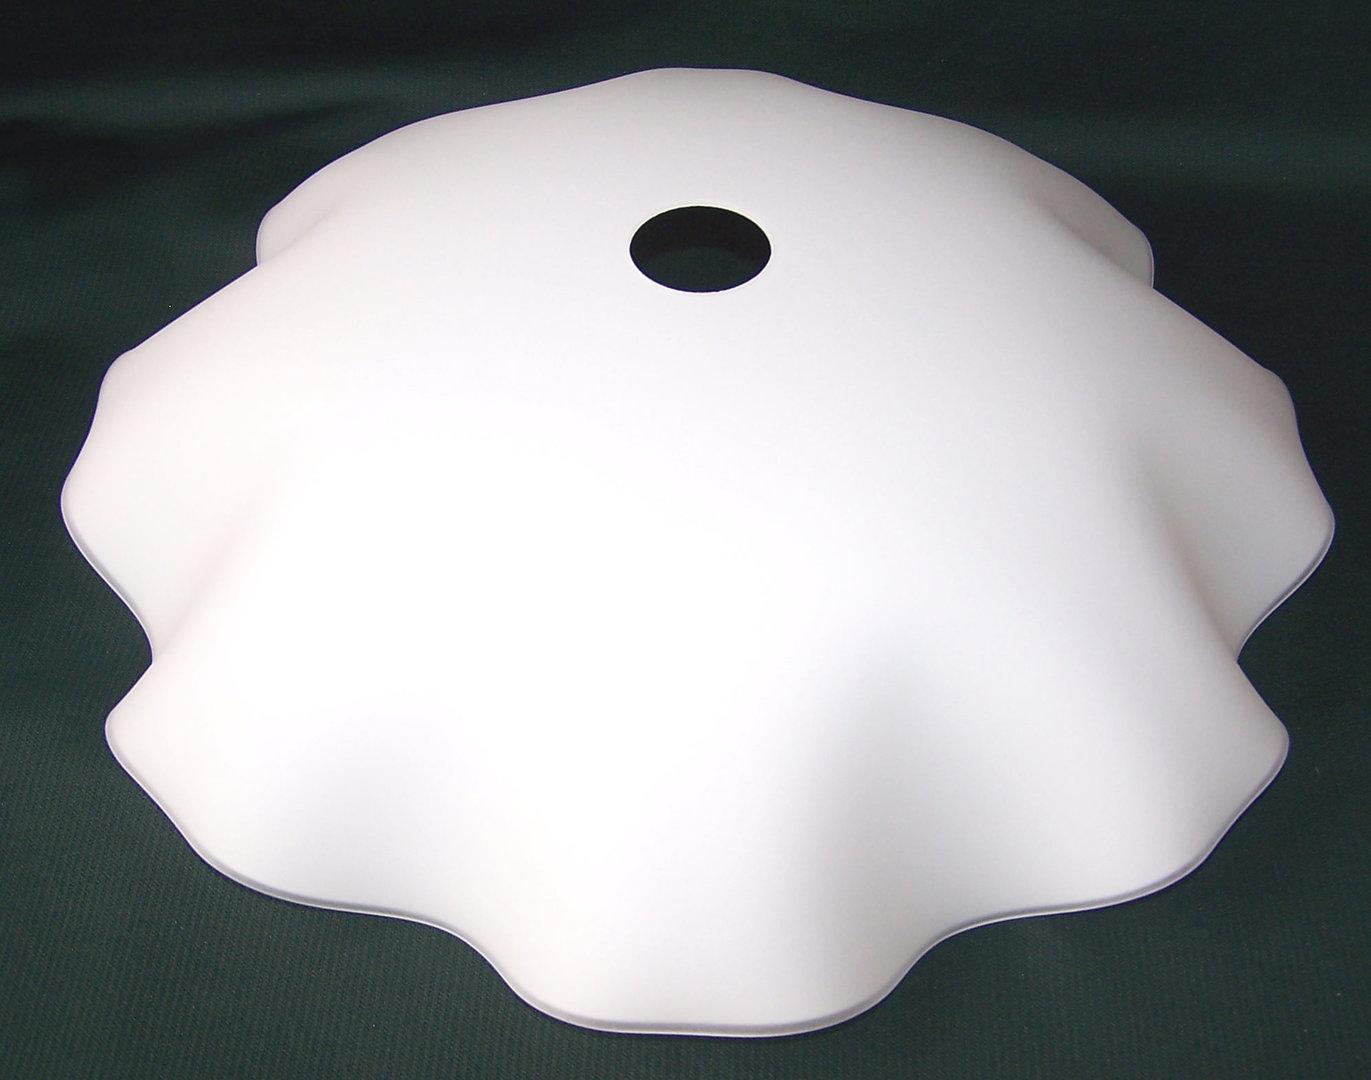 lampenschirm aus glas f r e 27 durchmesser 40 cm smerlato wellenrand. Black Bedroom Furniture Sets. Home Design Ideas